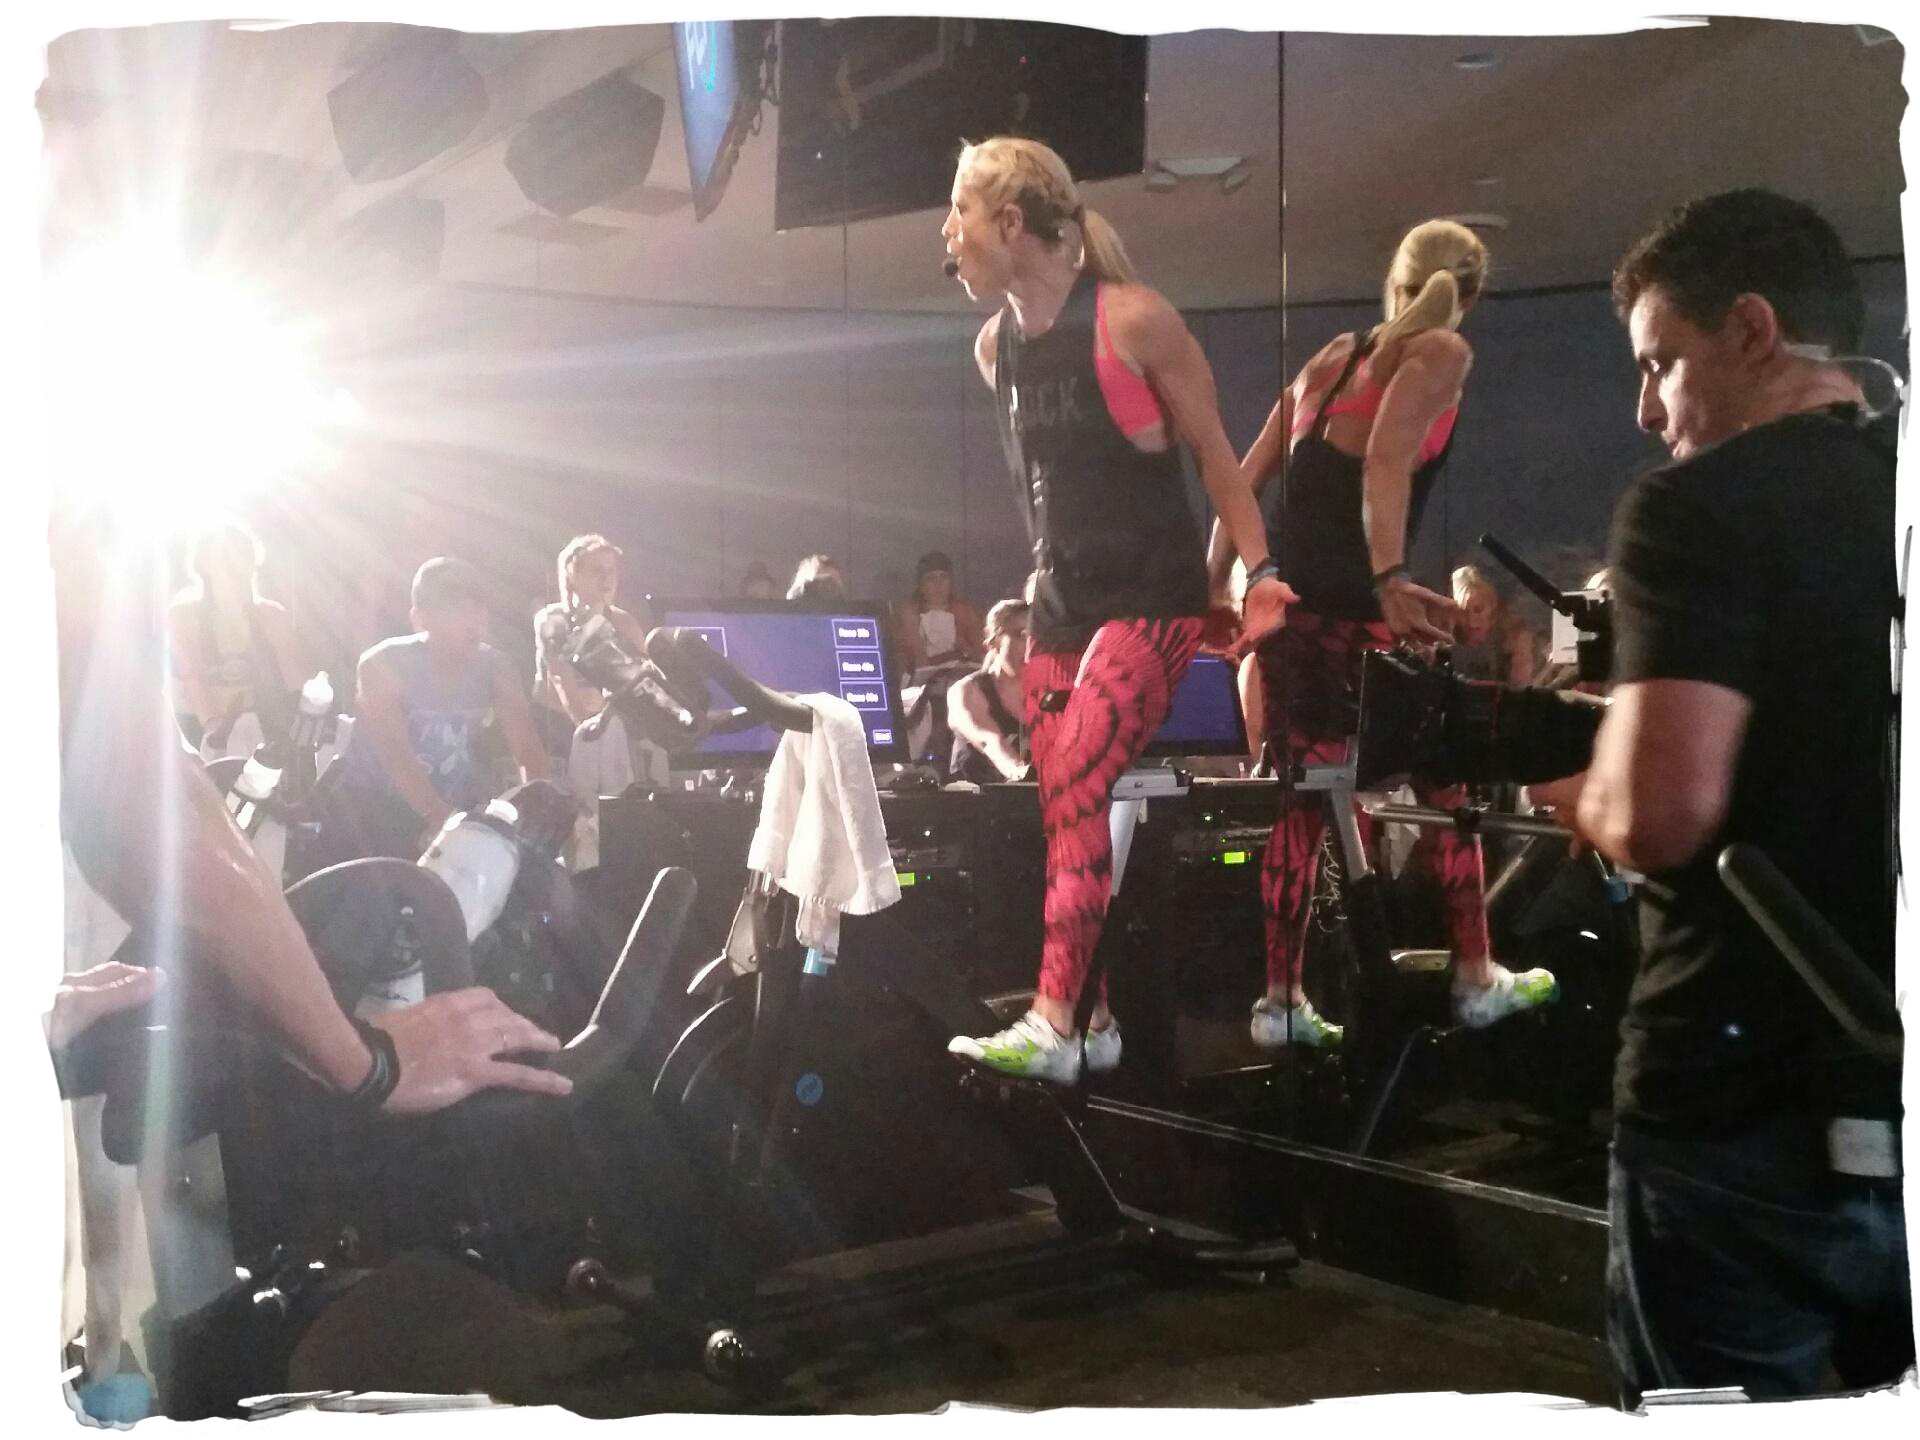 LACEY STONE CELEBRITY FITNESS TRAINER +   CELEB TRAINER ON E! 's REVENGE BODY WITH KHLOE KARDASHIAN